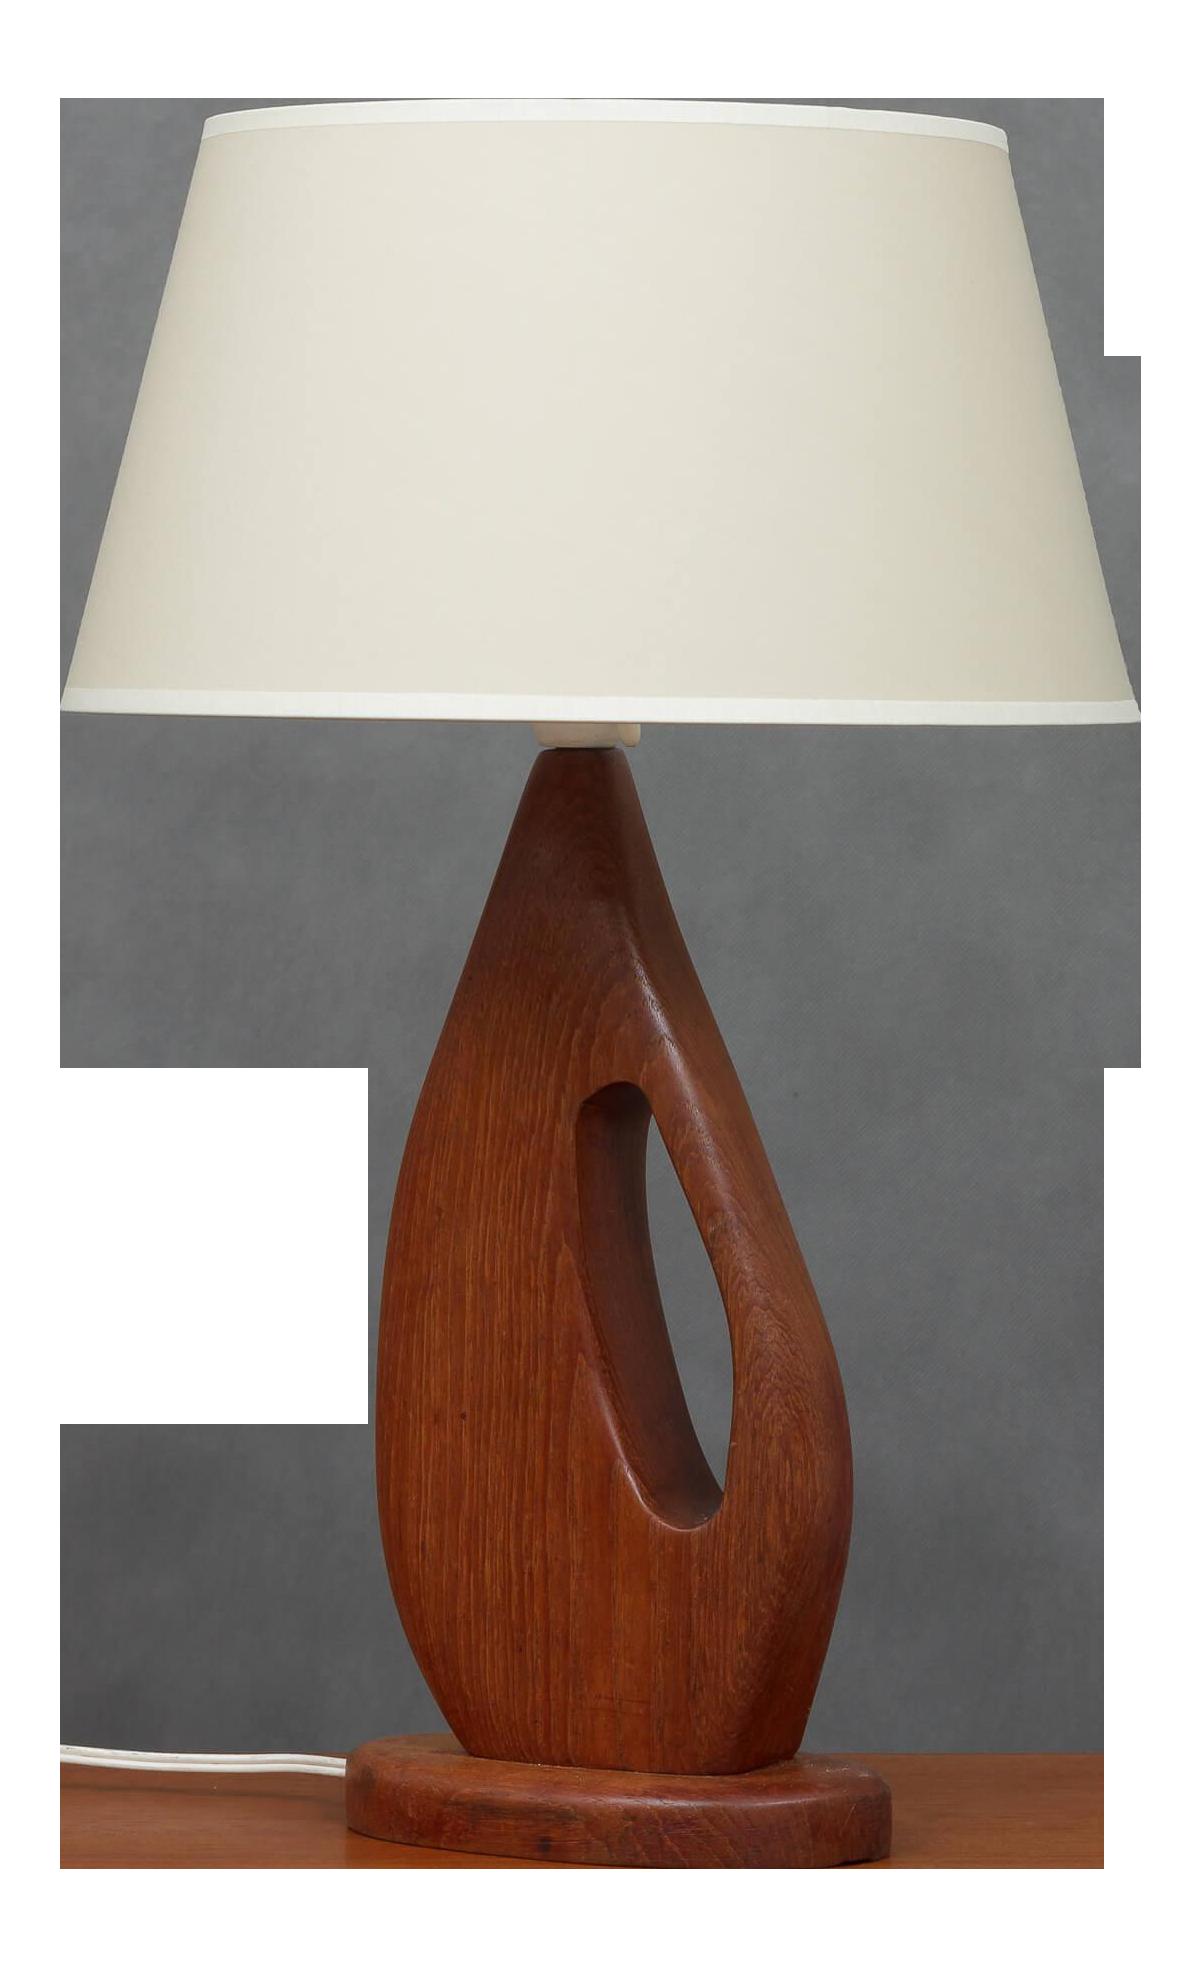 Image of: 1960s Mid Century Modern Danish Teak Desk Table Lamp Chairish